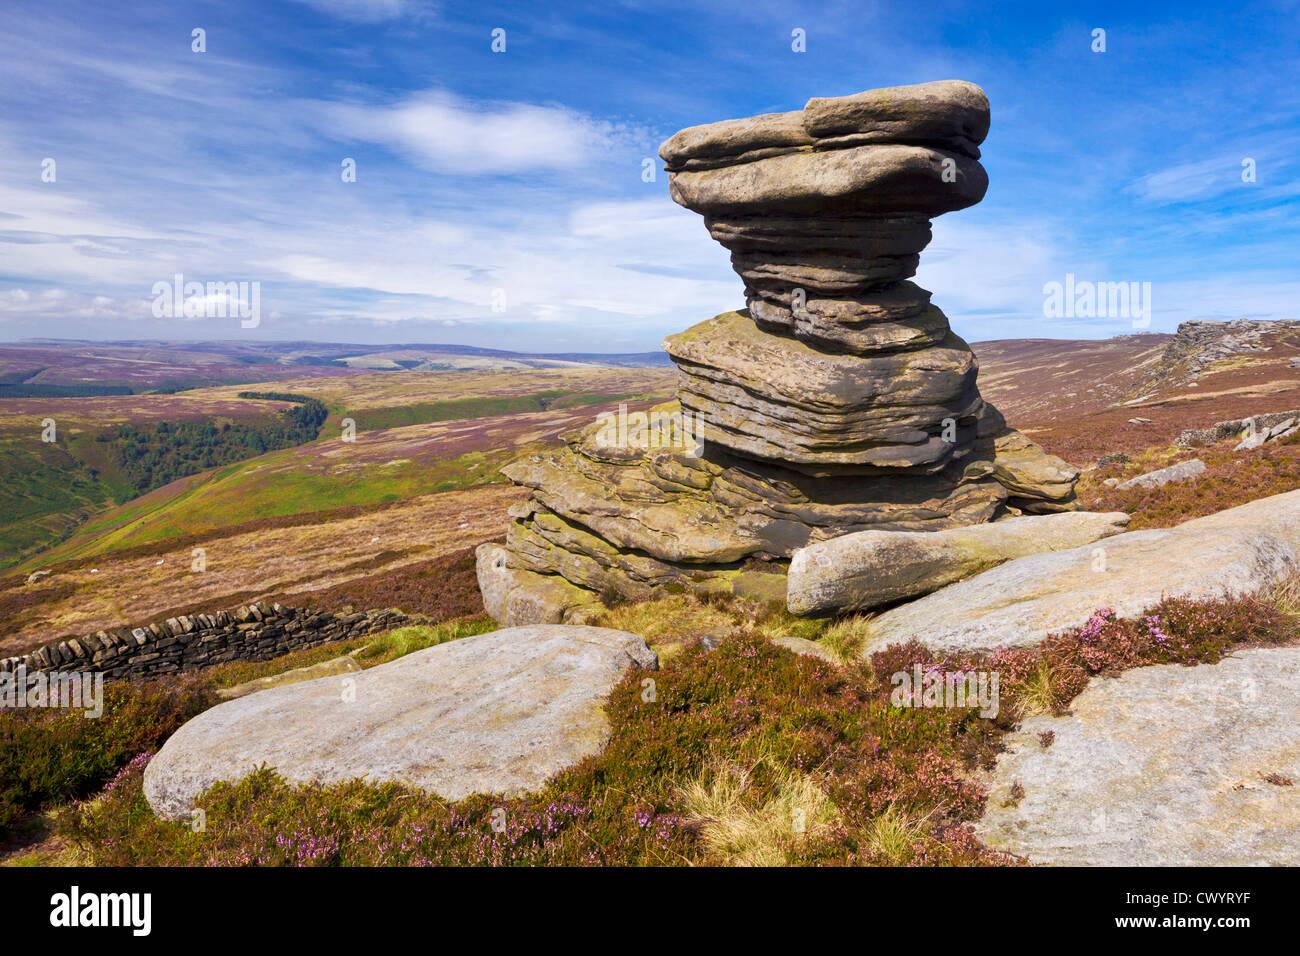 The Salt Cellar rock formation Derwent Edge Peak District National Park Derbyshire  England UK GB EU Europe - Stock Image